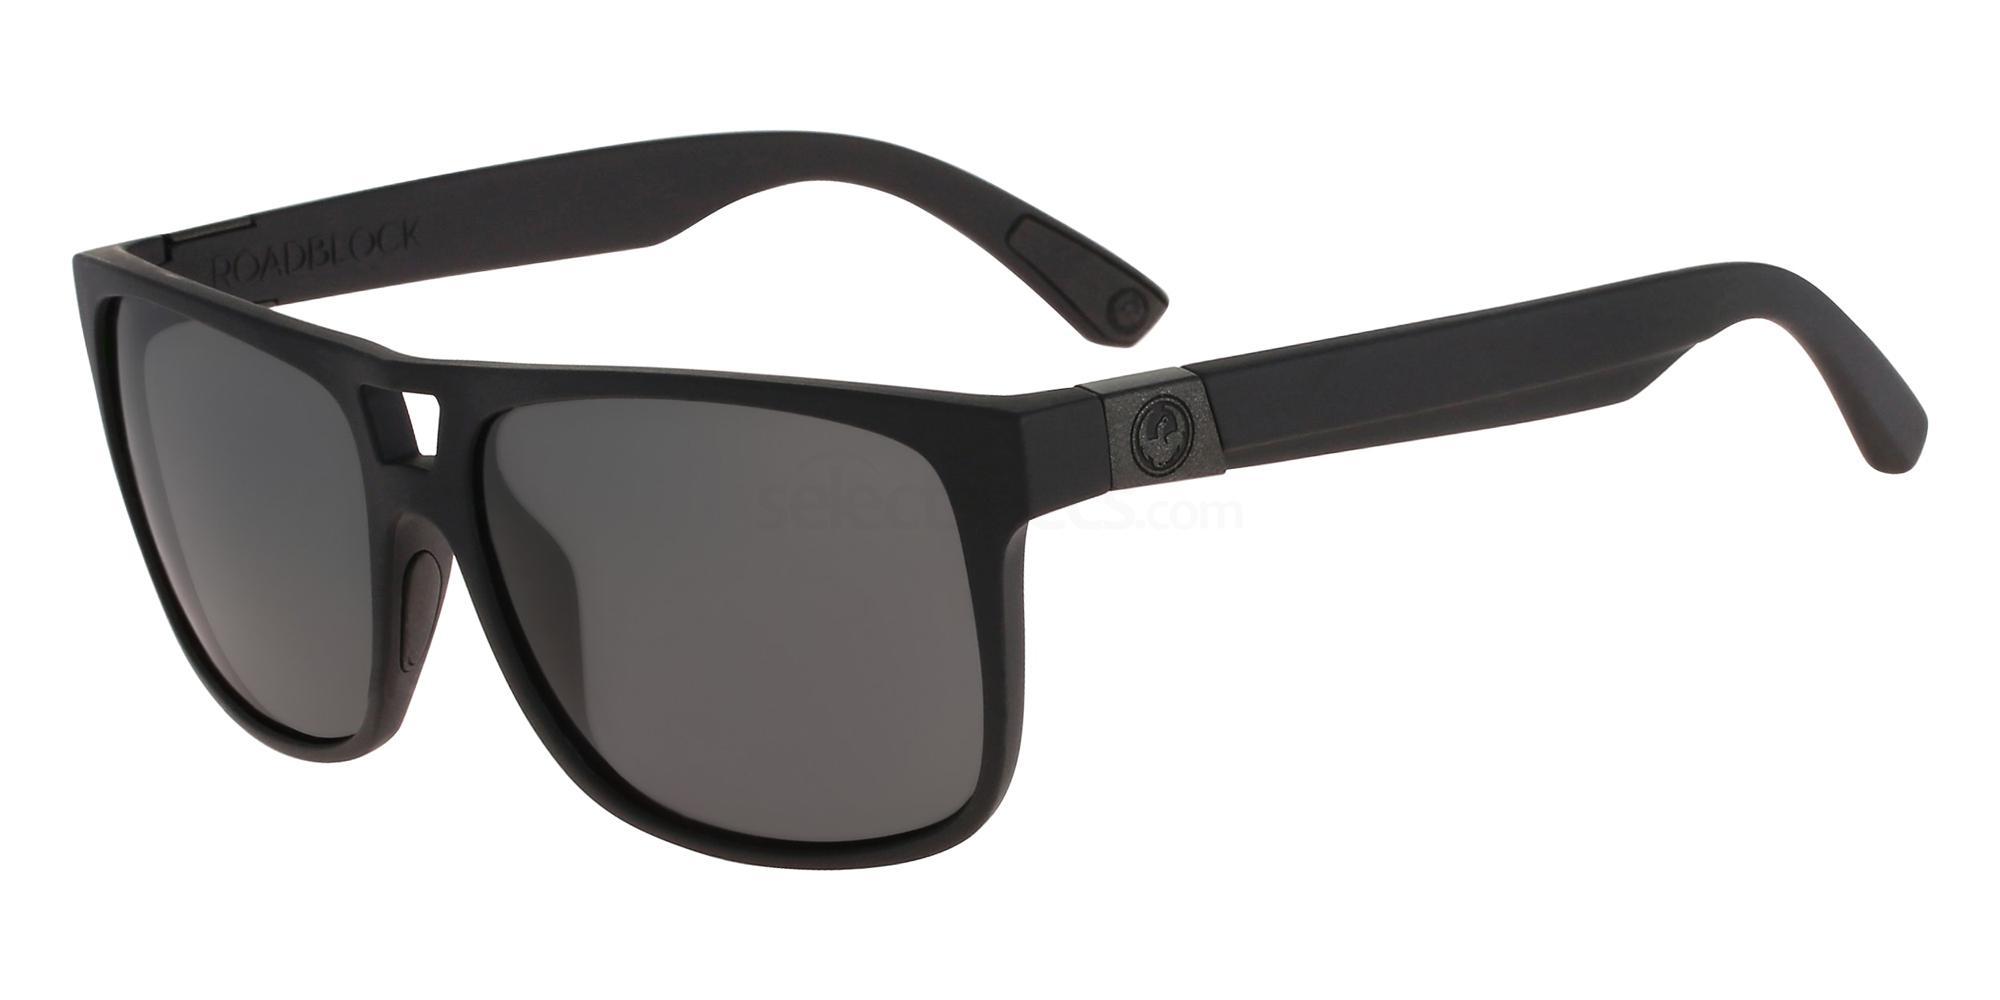 003 DR ROADBLOCK Sunglasses, Dragon